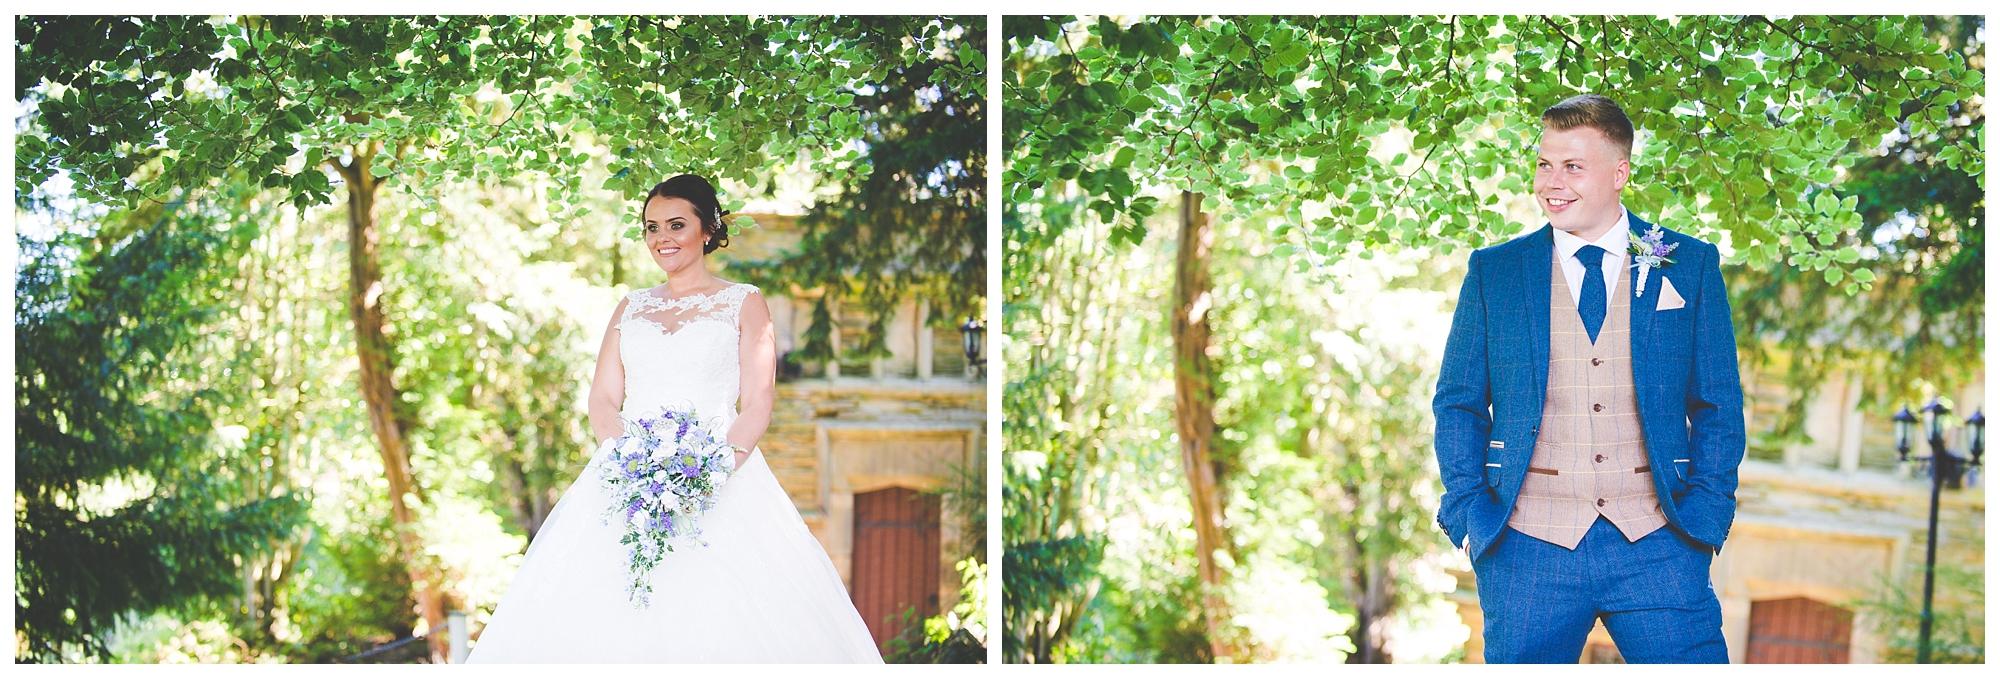 Bagden-Hall-Wedding-Photography_0058